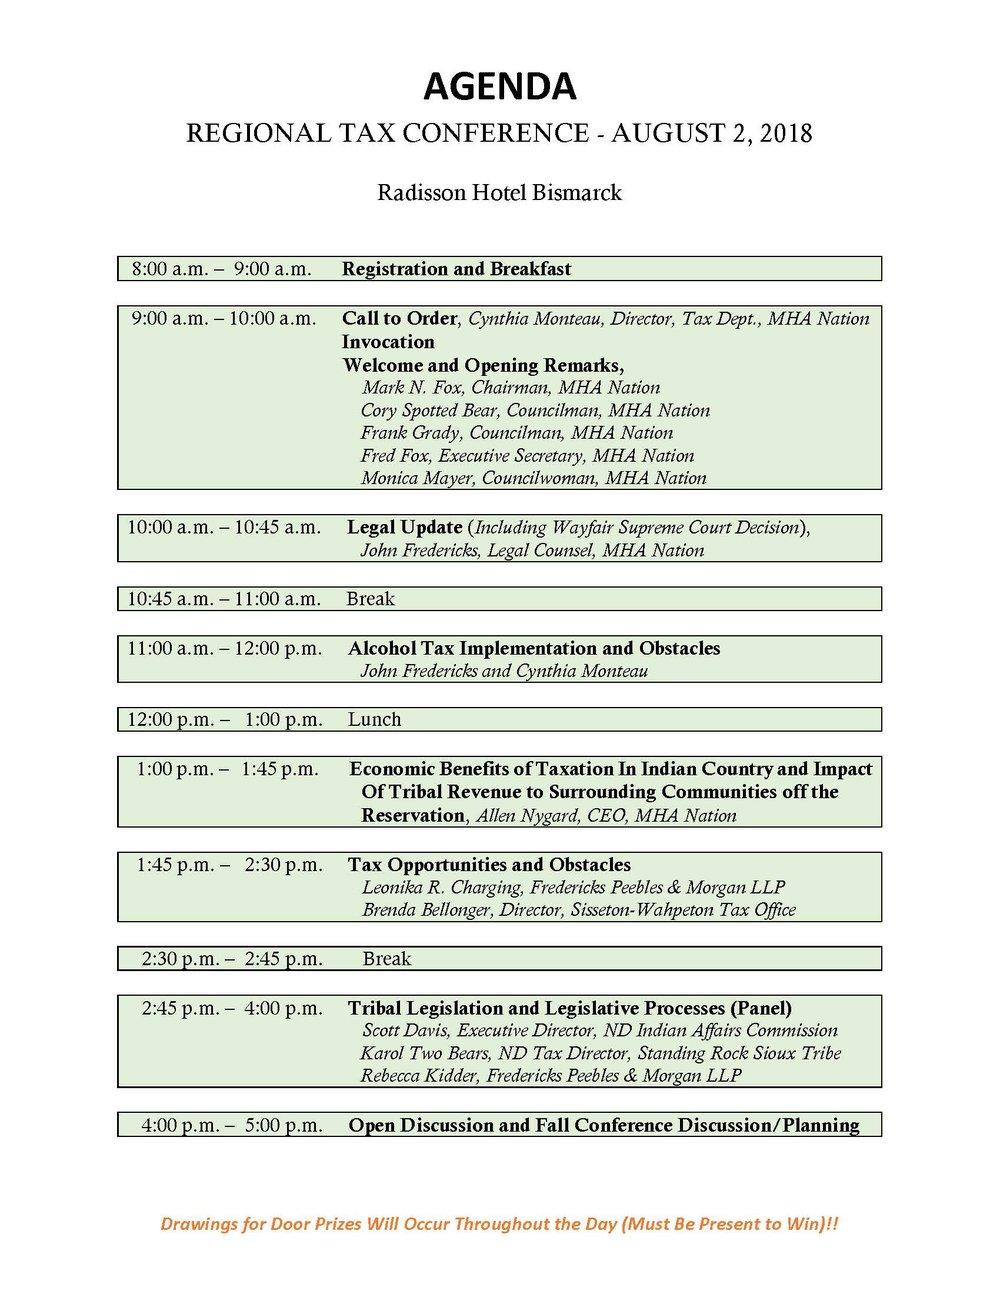 2018 Regional Tax Conference Agenda.jpg